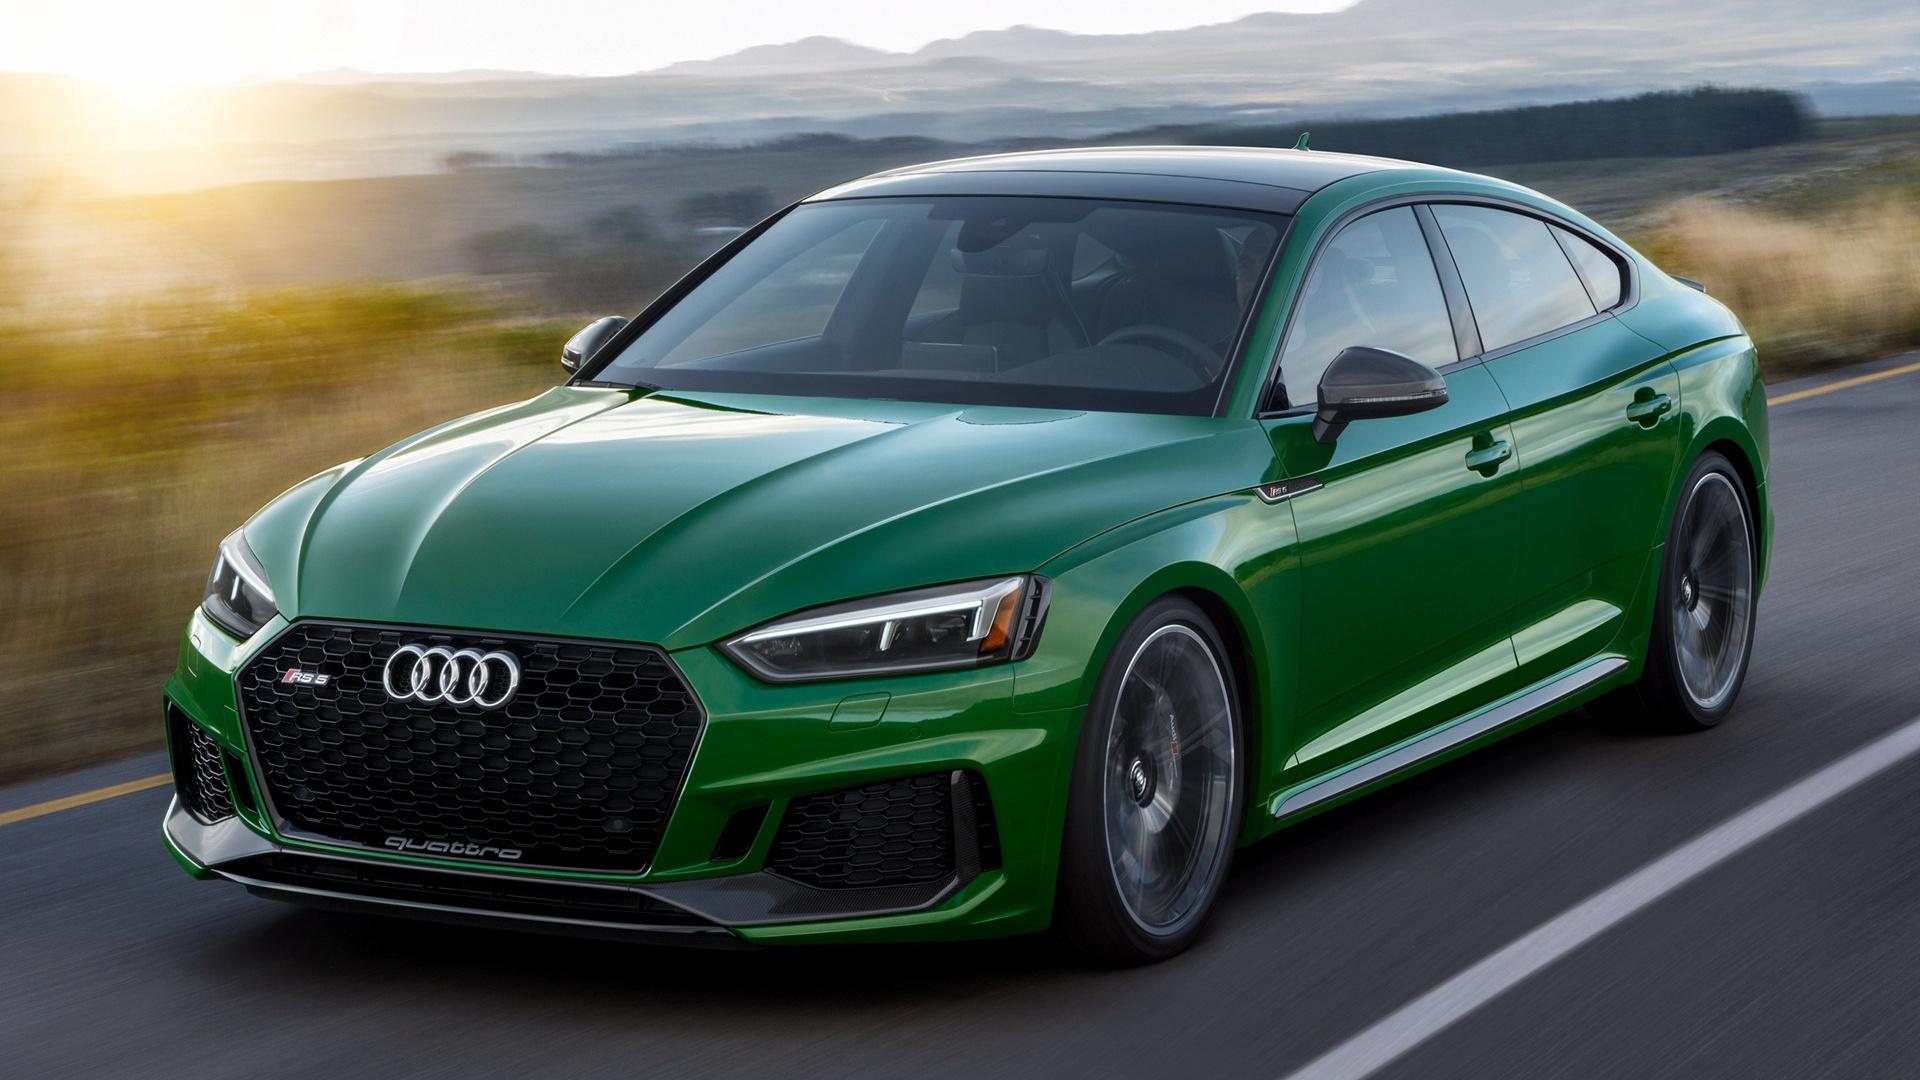 2019 Audi Rs 5 Sportback Us Fondos De Pantalla E